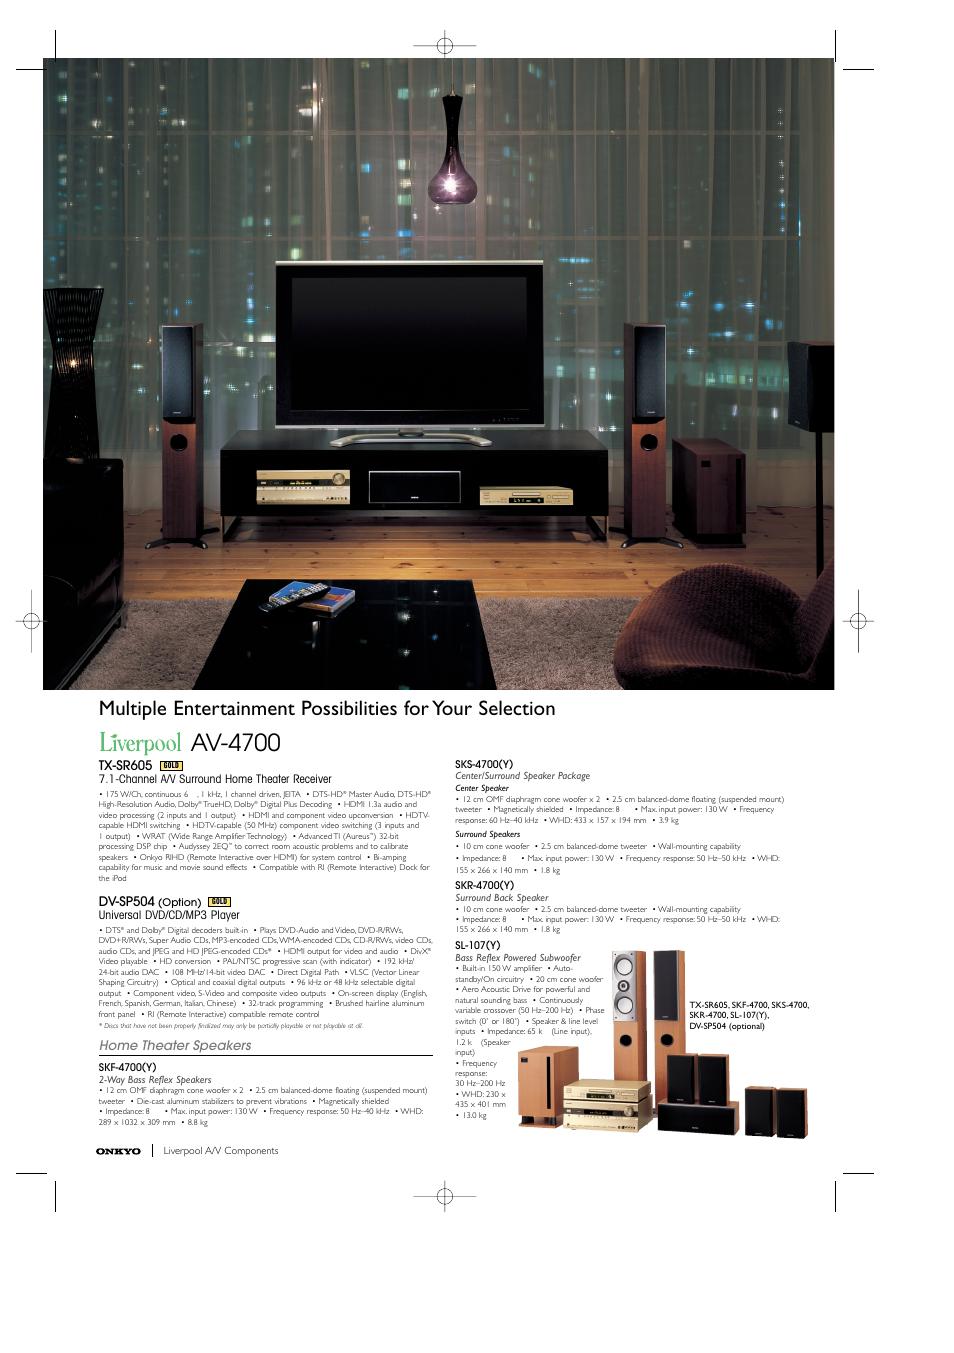 av 4700 tx sr605 dv sp504 onkyo dx 7355 user manual page 8 8 rh manualsdir com Best Onkyo Home Theater System Onkyo Home Theater System